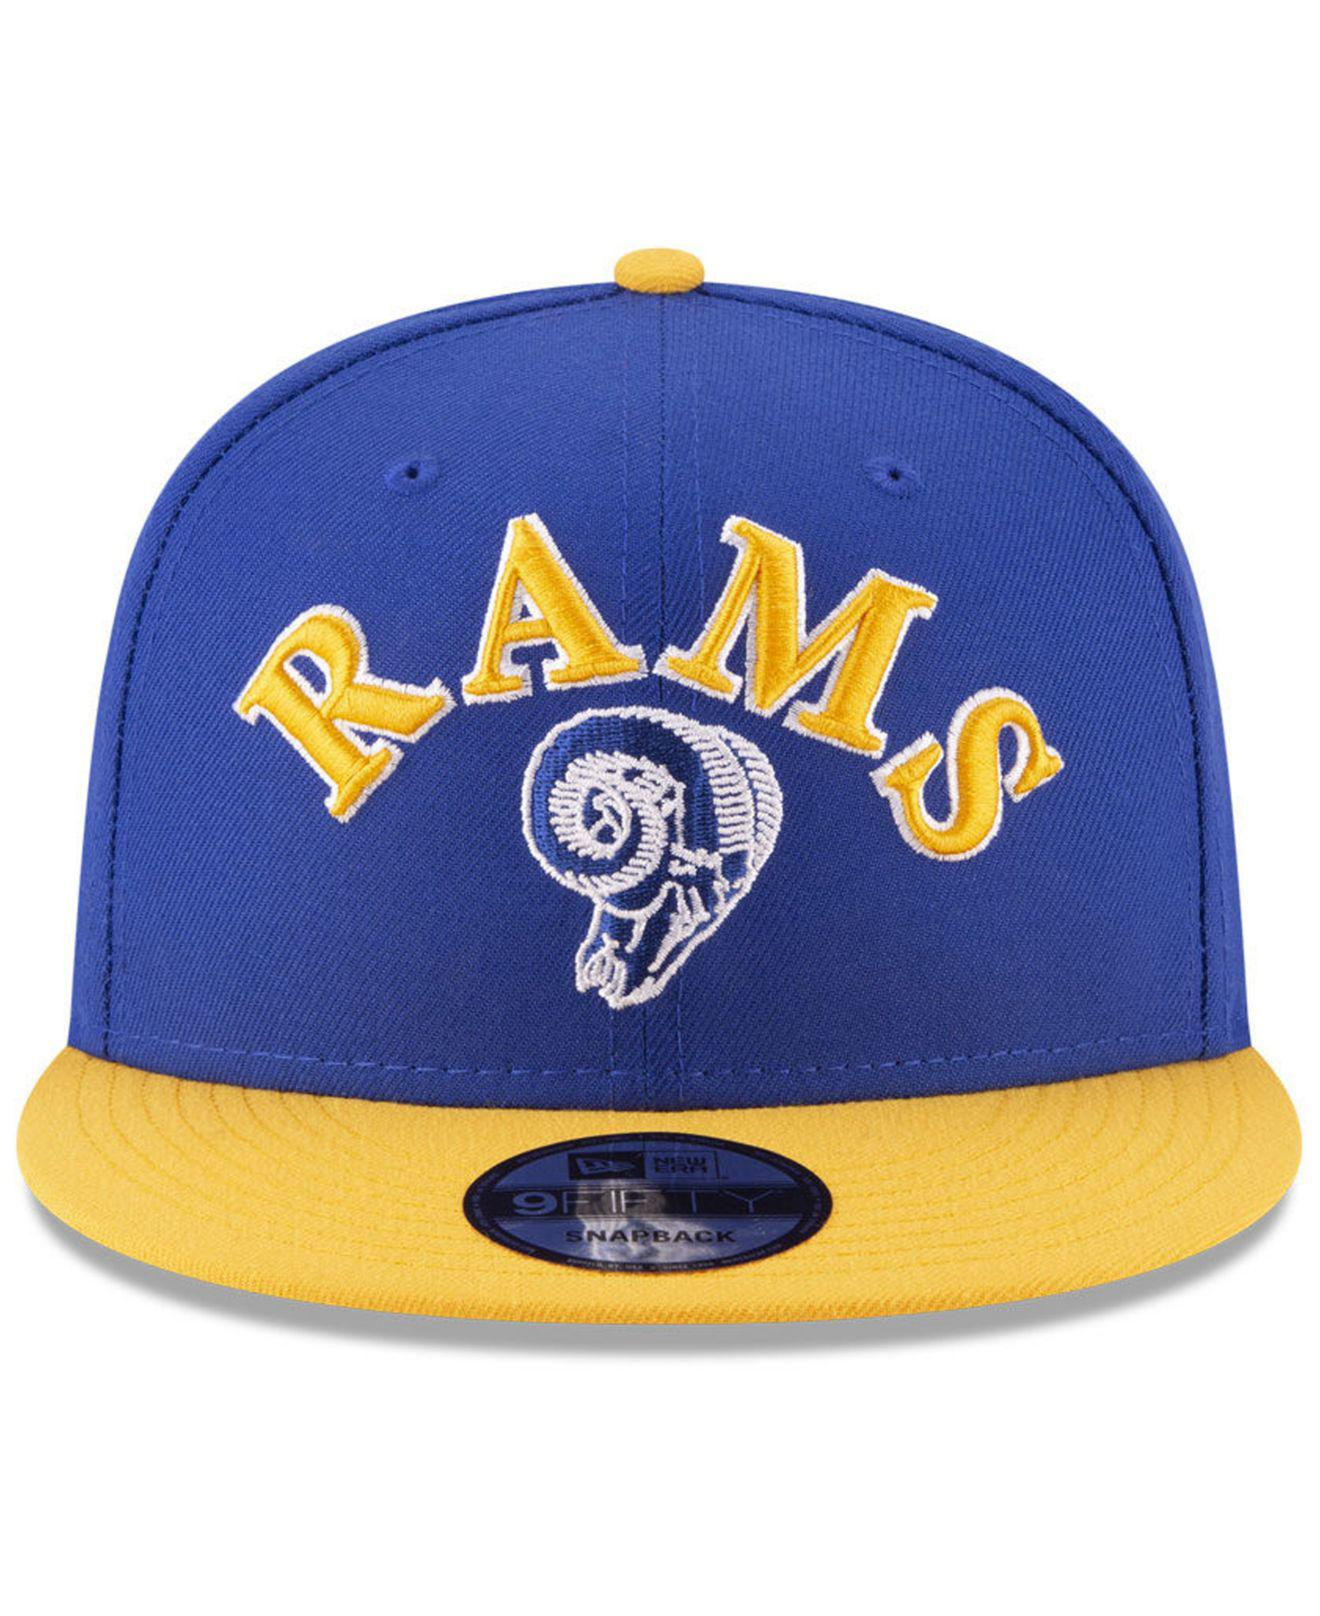 finest selection 4c7f3 94908 KTZ Los Angeles Rams Retro Logo 9fifty Snapback Cap in Blue for Men ...